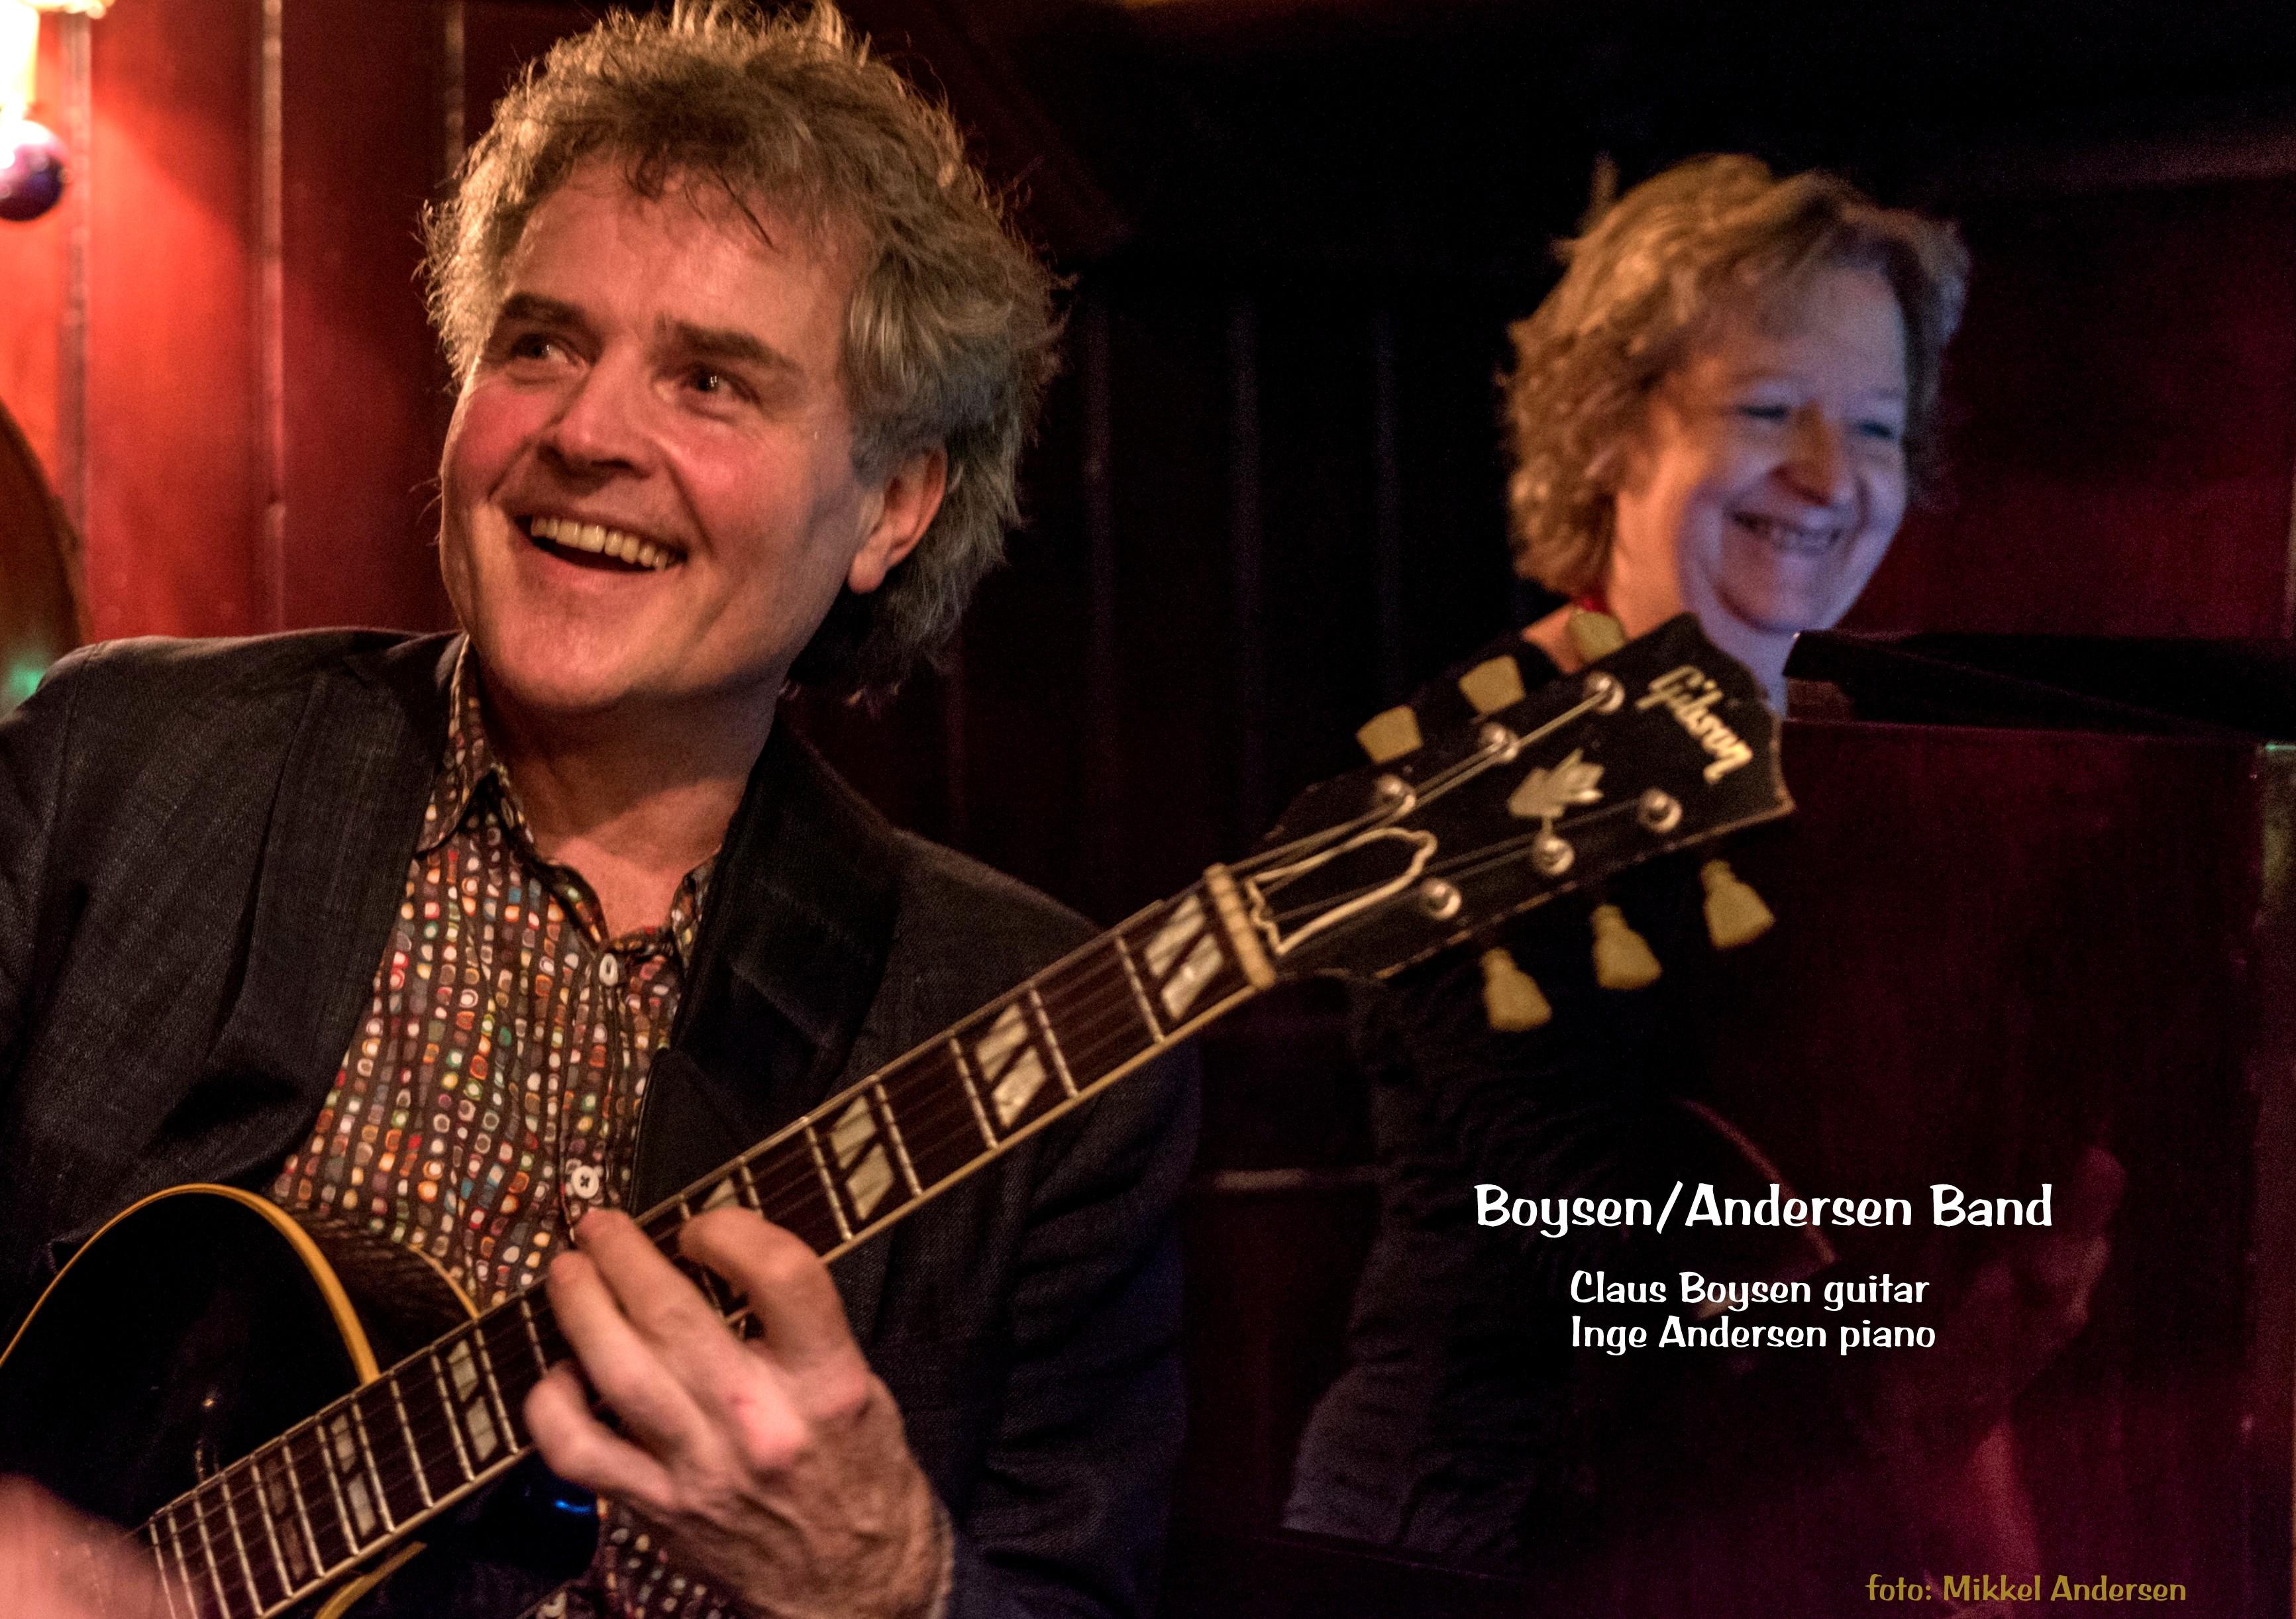 Boysen Andersen Band